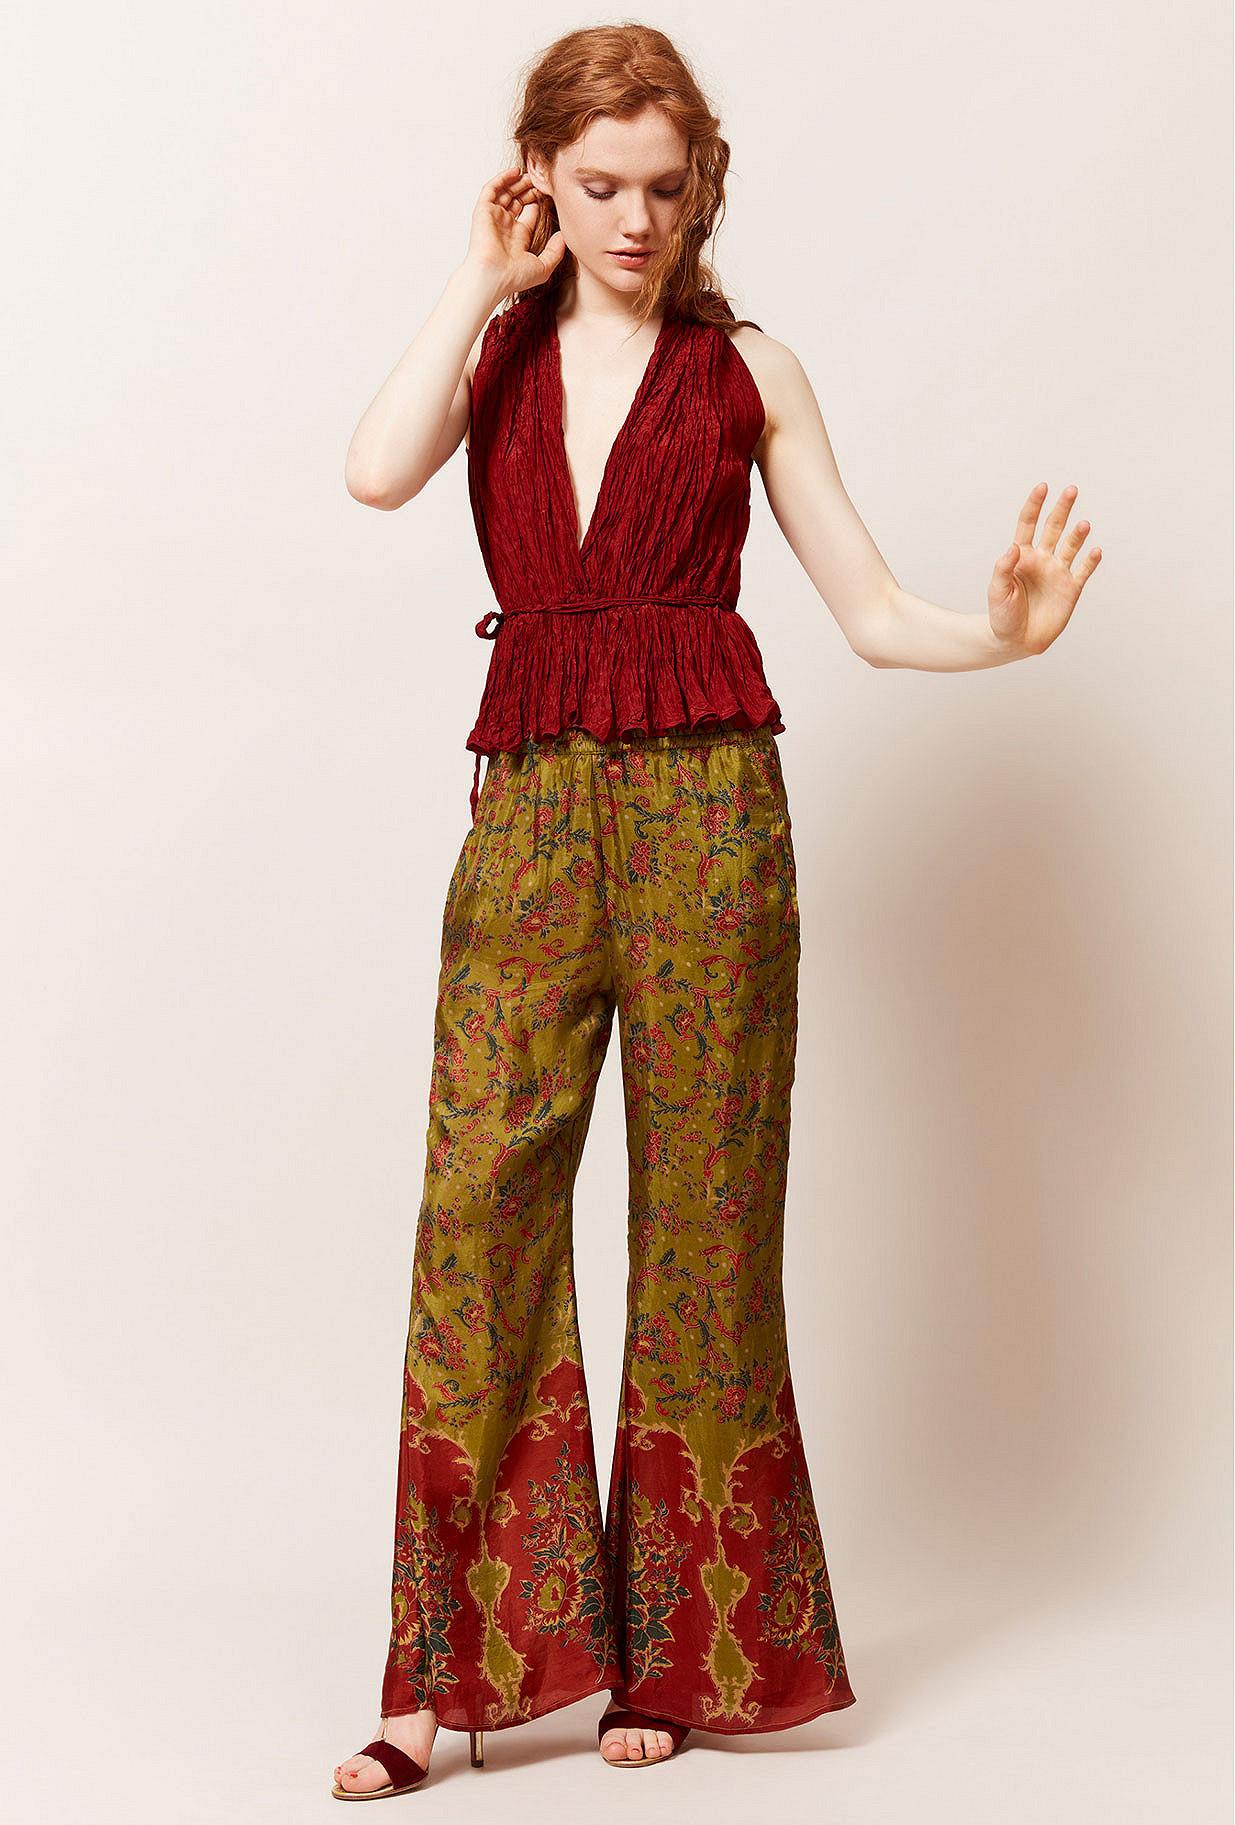 Green print  Pant  Django Mes demoiselles fashion clothes designer Paris